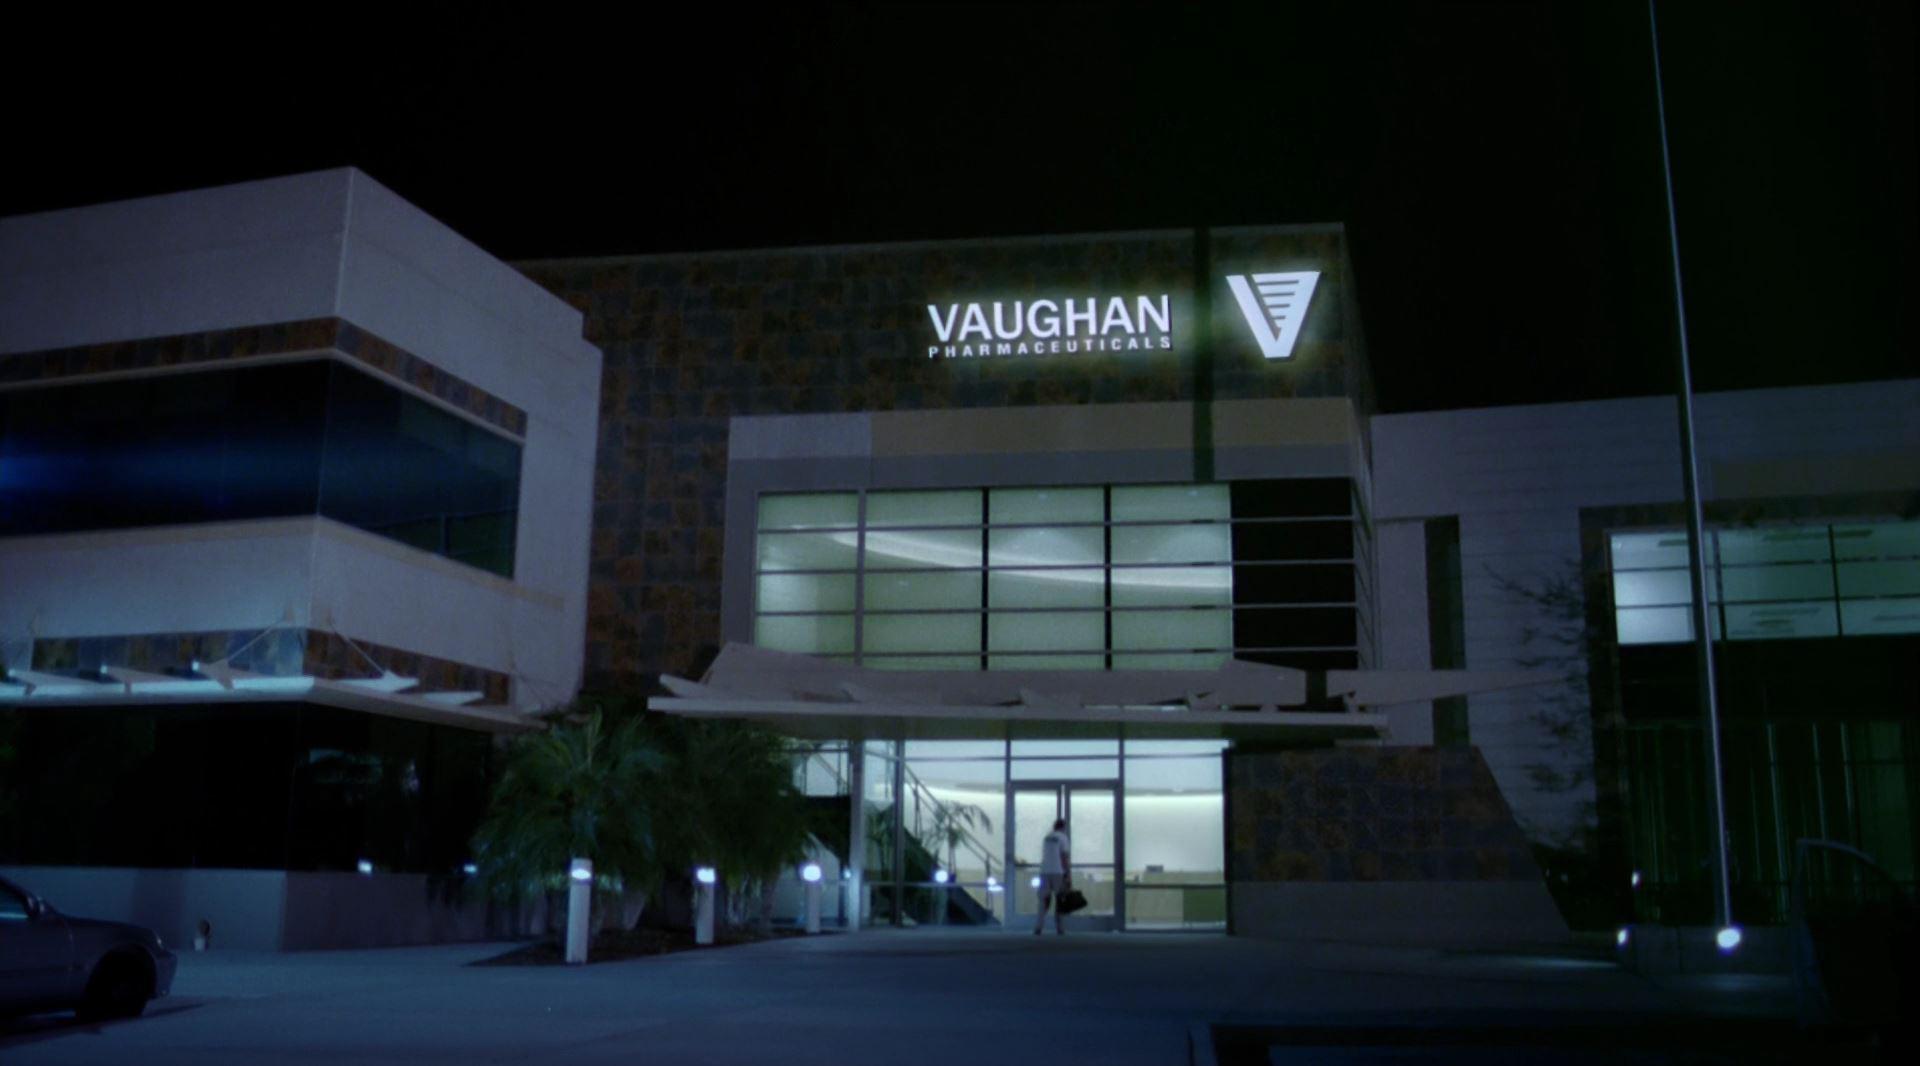 Vaughan Pharamaceuticals